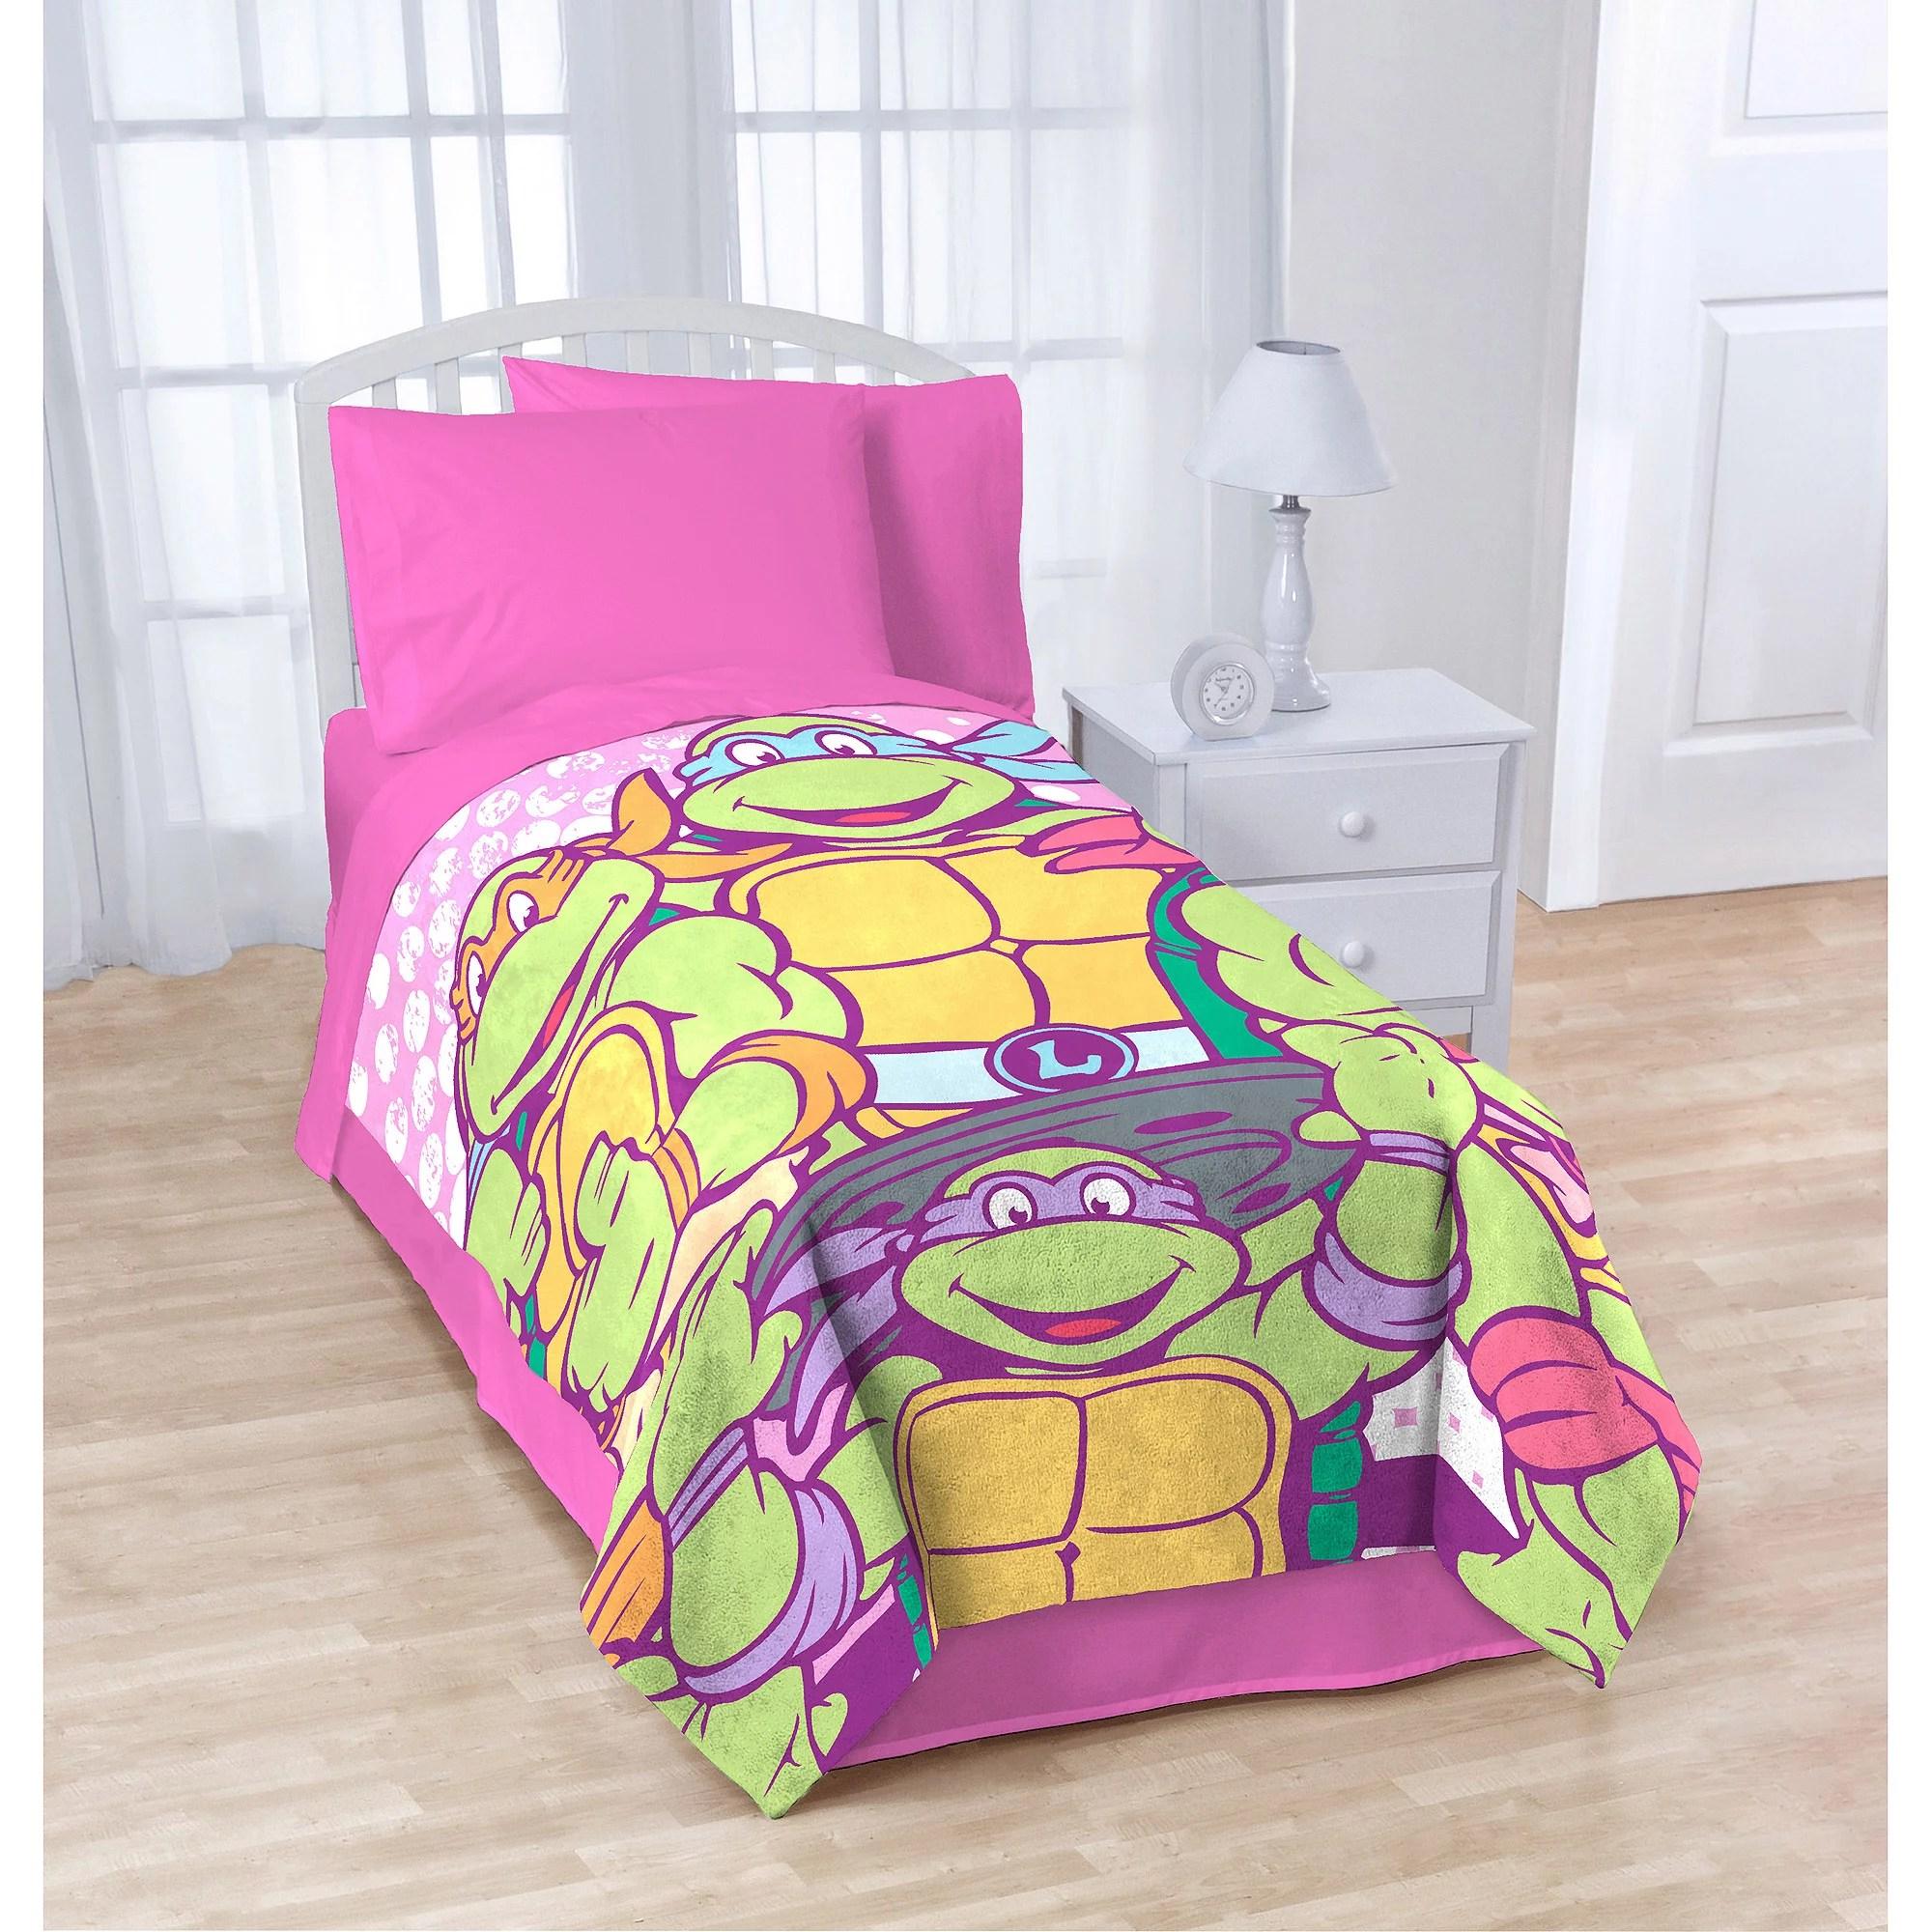 Nickelodeon Teenage Mutant Ninja Turtles SHELLASTIC Blanket  Walmartcom